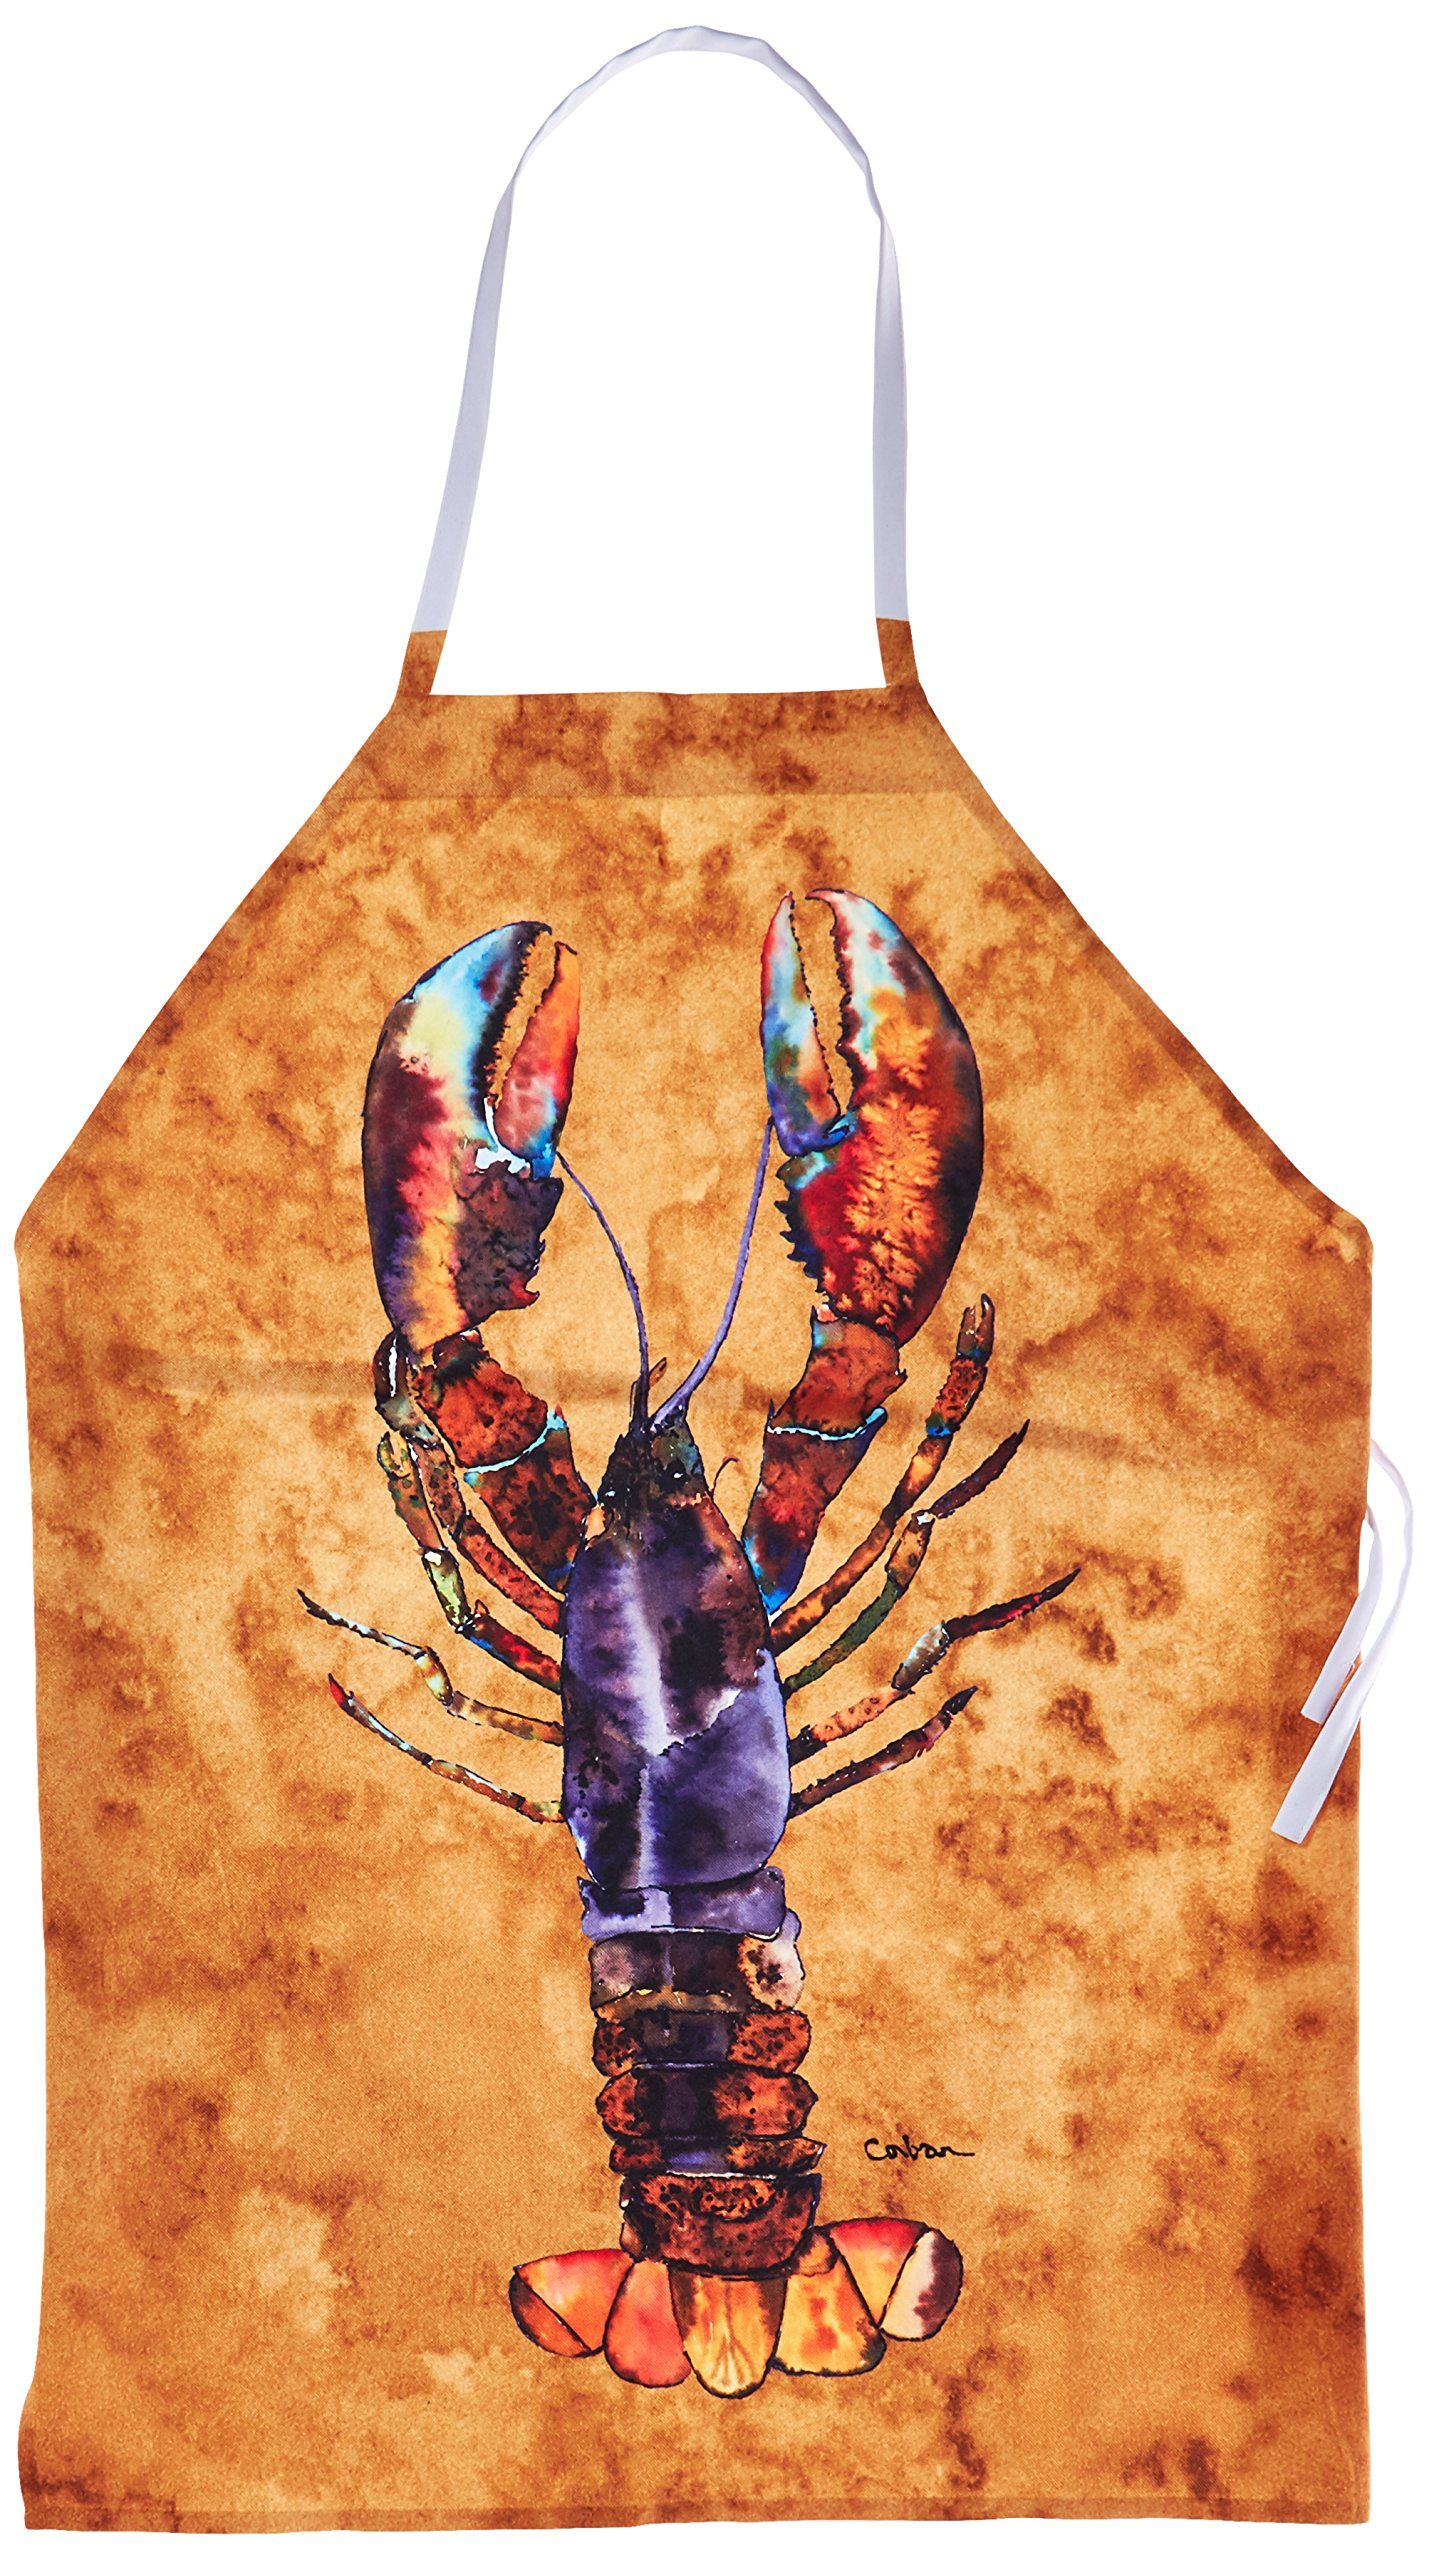 Multicolor 3.5 H x 3.5 W Carolines Treasures BB1015-BL-OR-FC Lobster Burlap and Orange Foam Coasters Set of 4